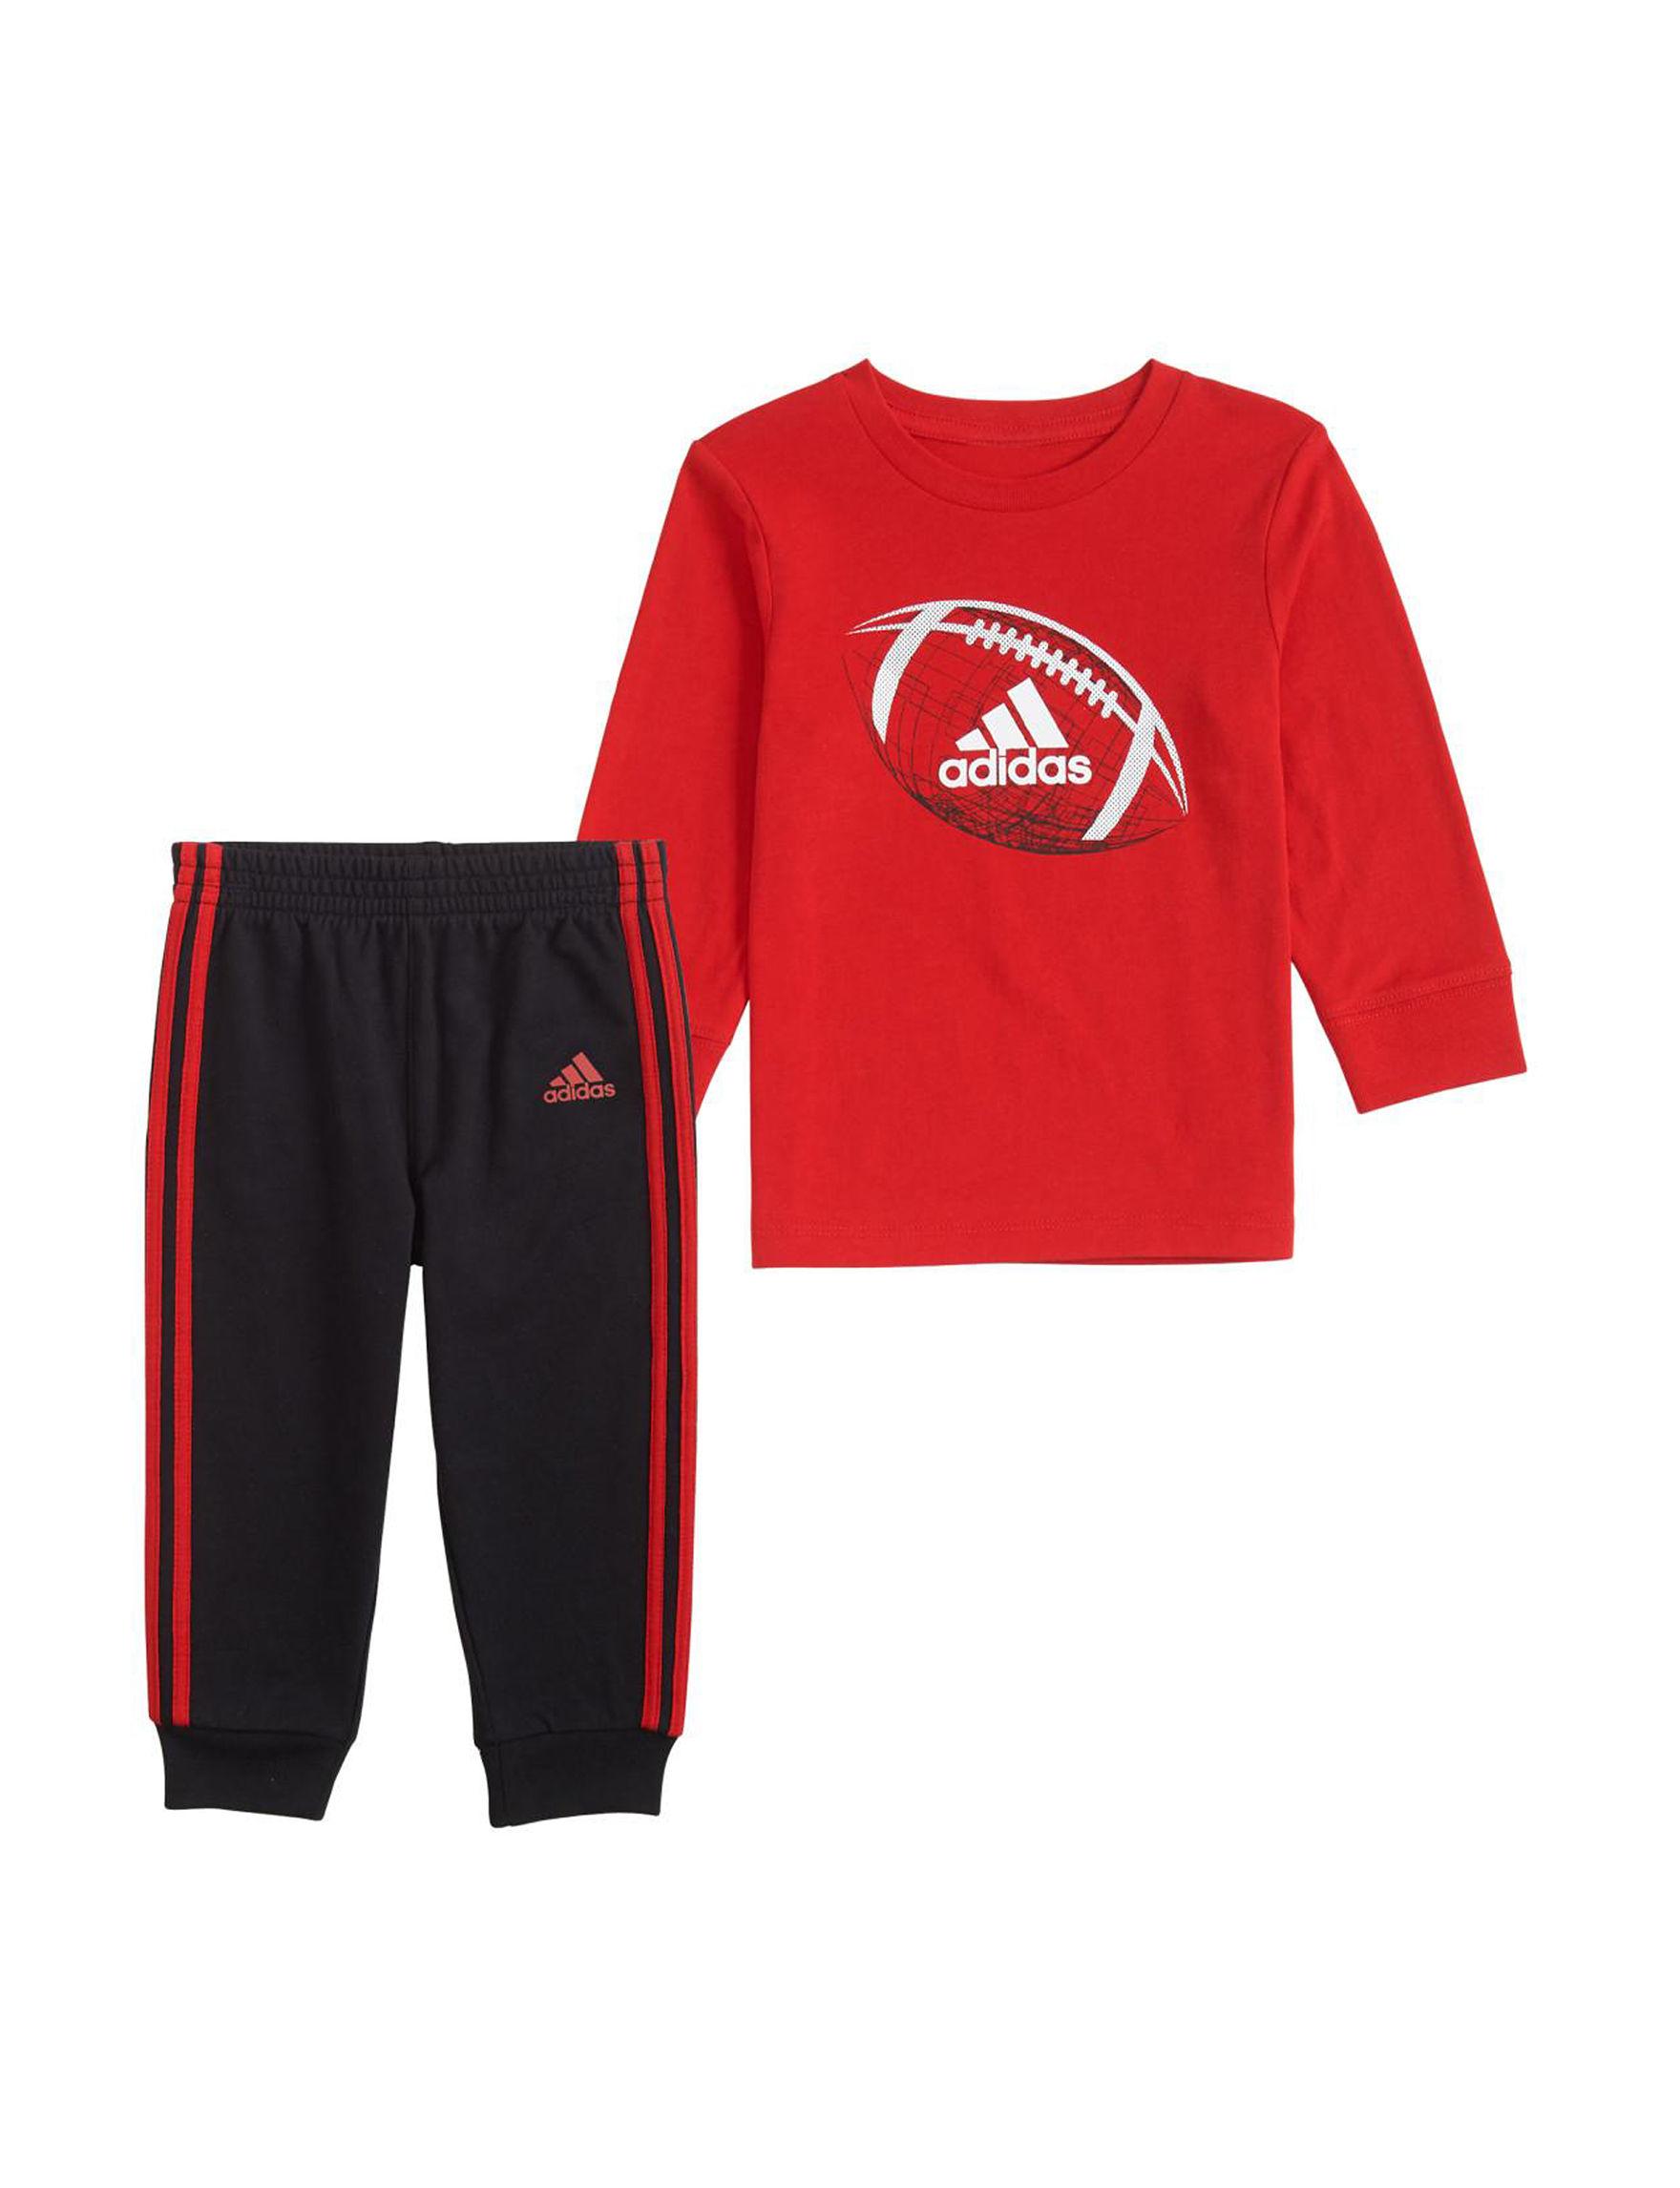 Adidas Red / Black